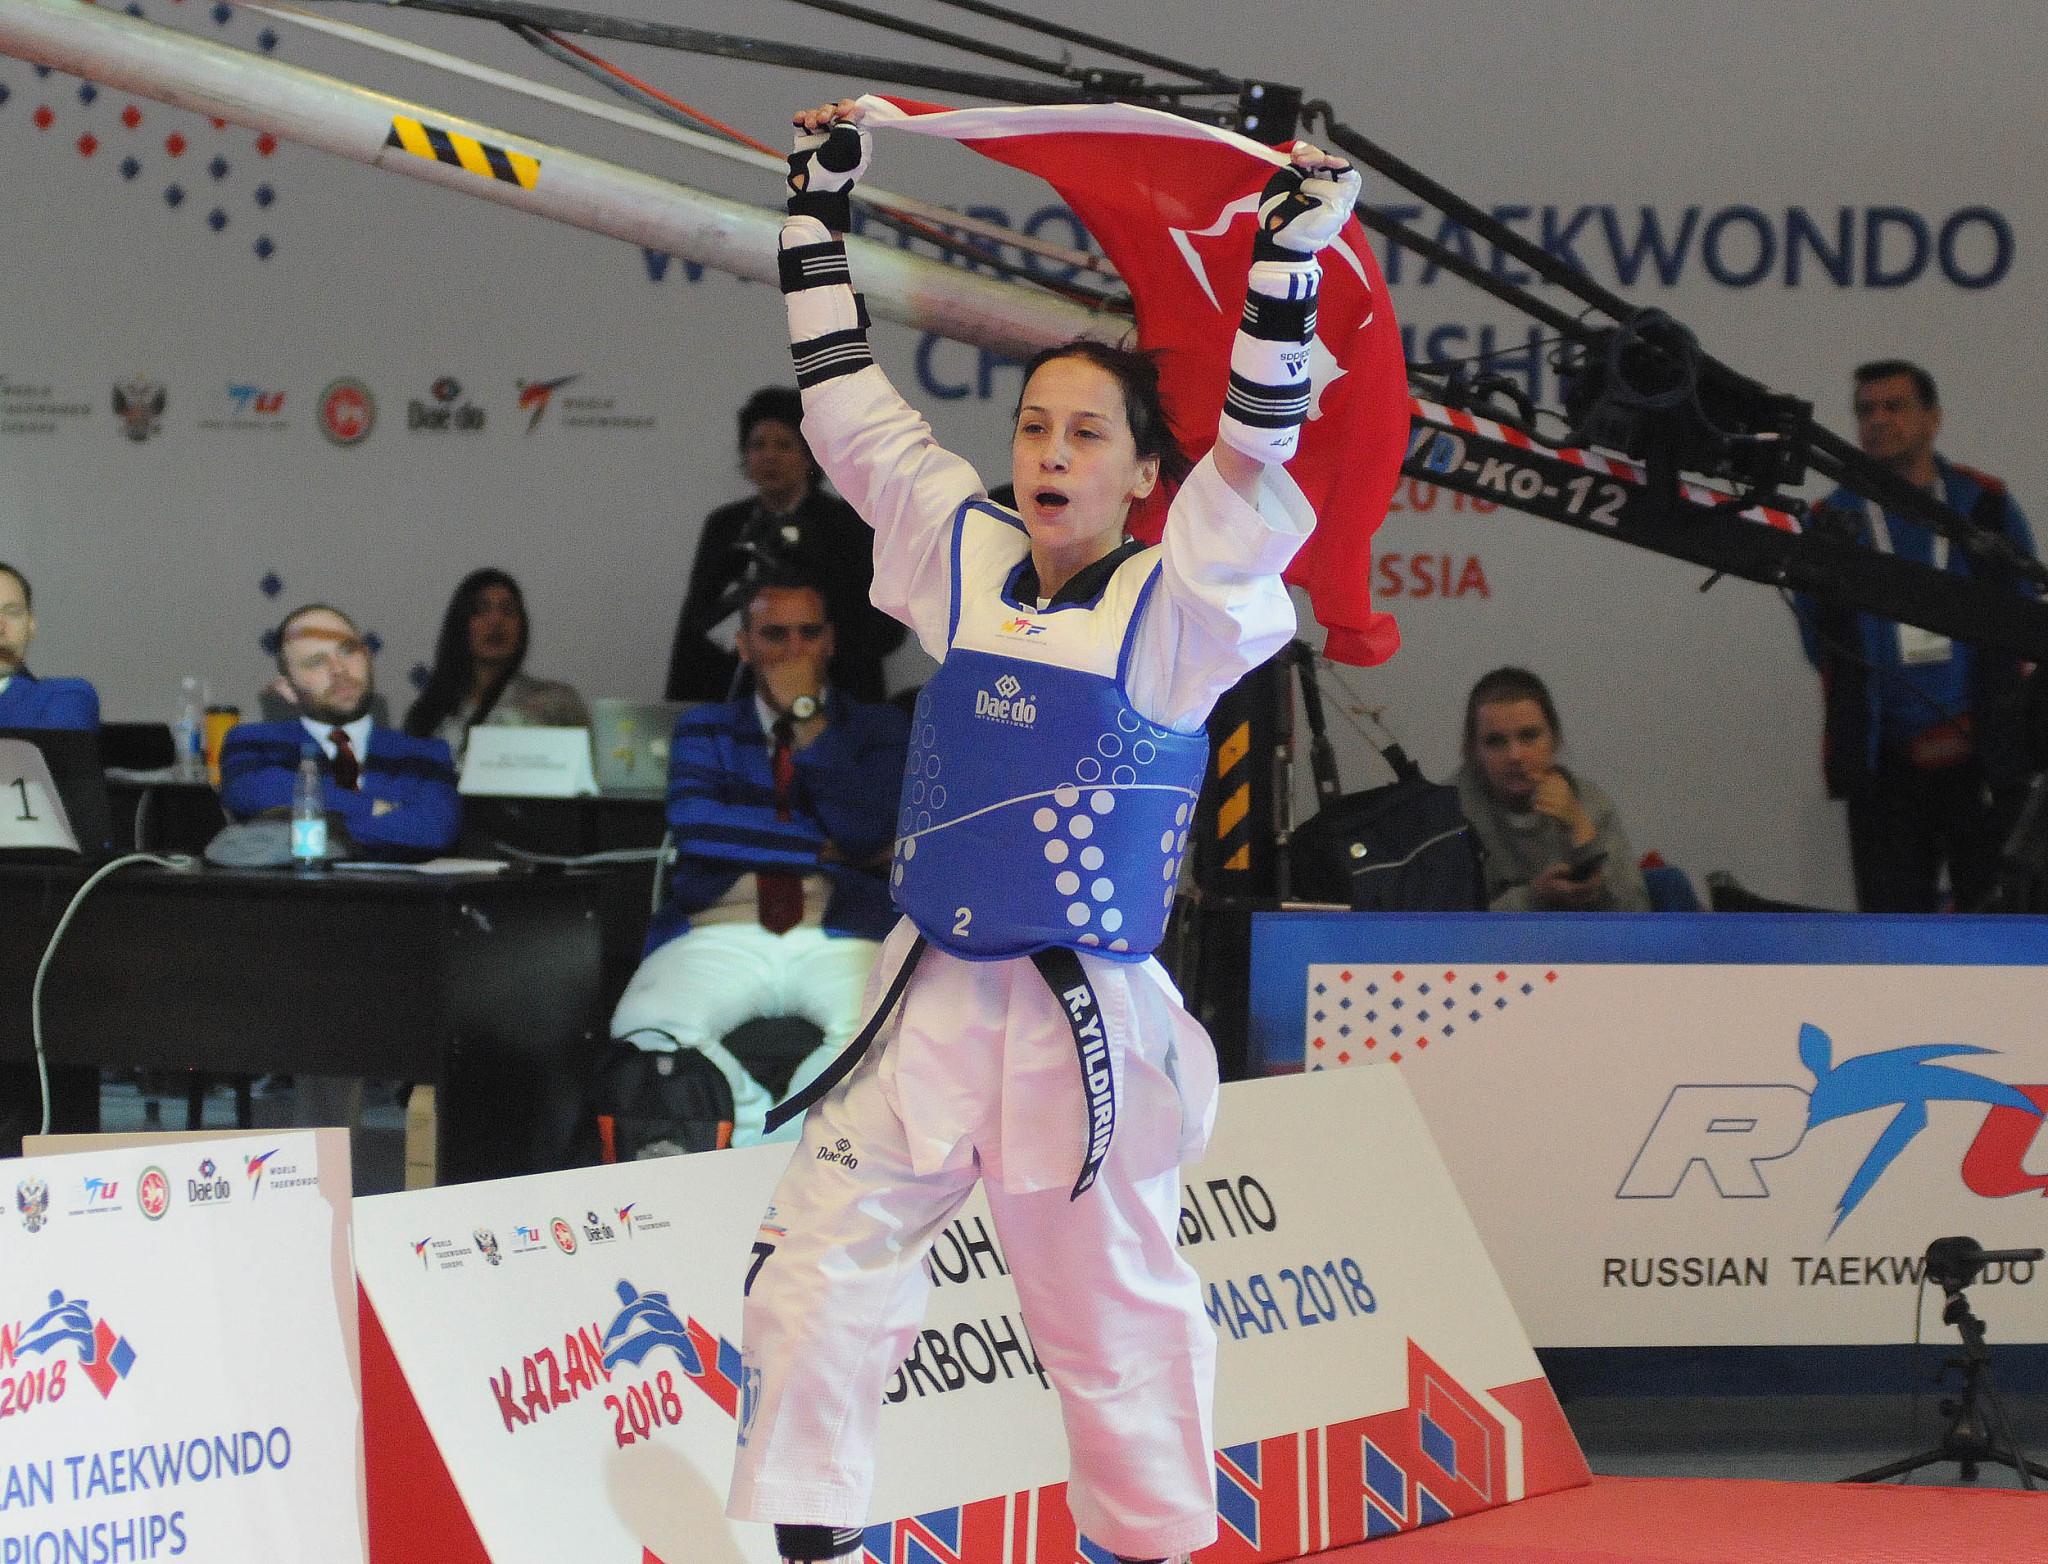 Turkey's Yildirim among winners on opening day of European Taekwondo Championships